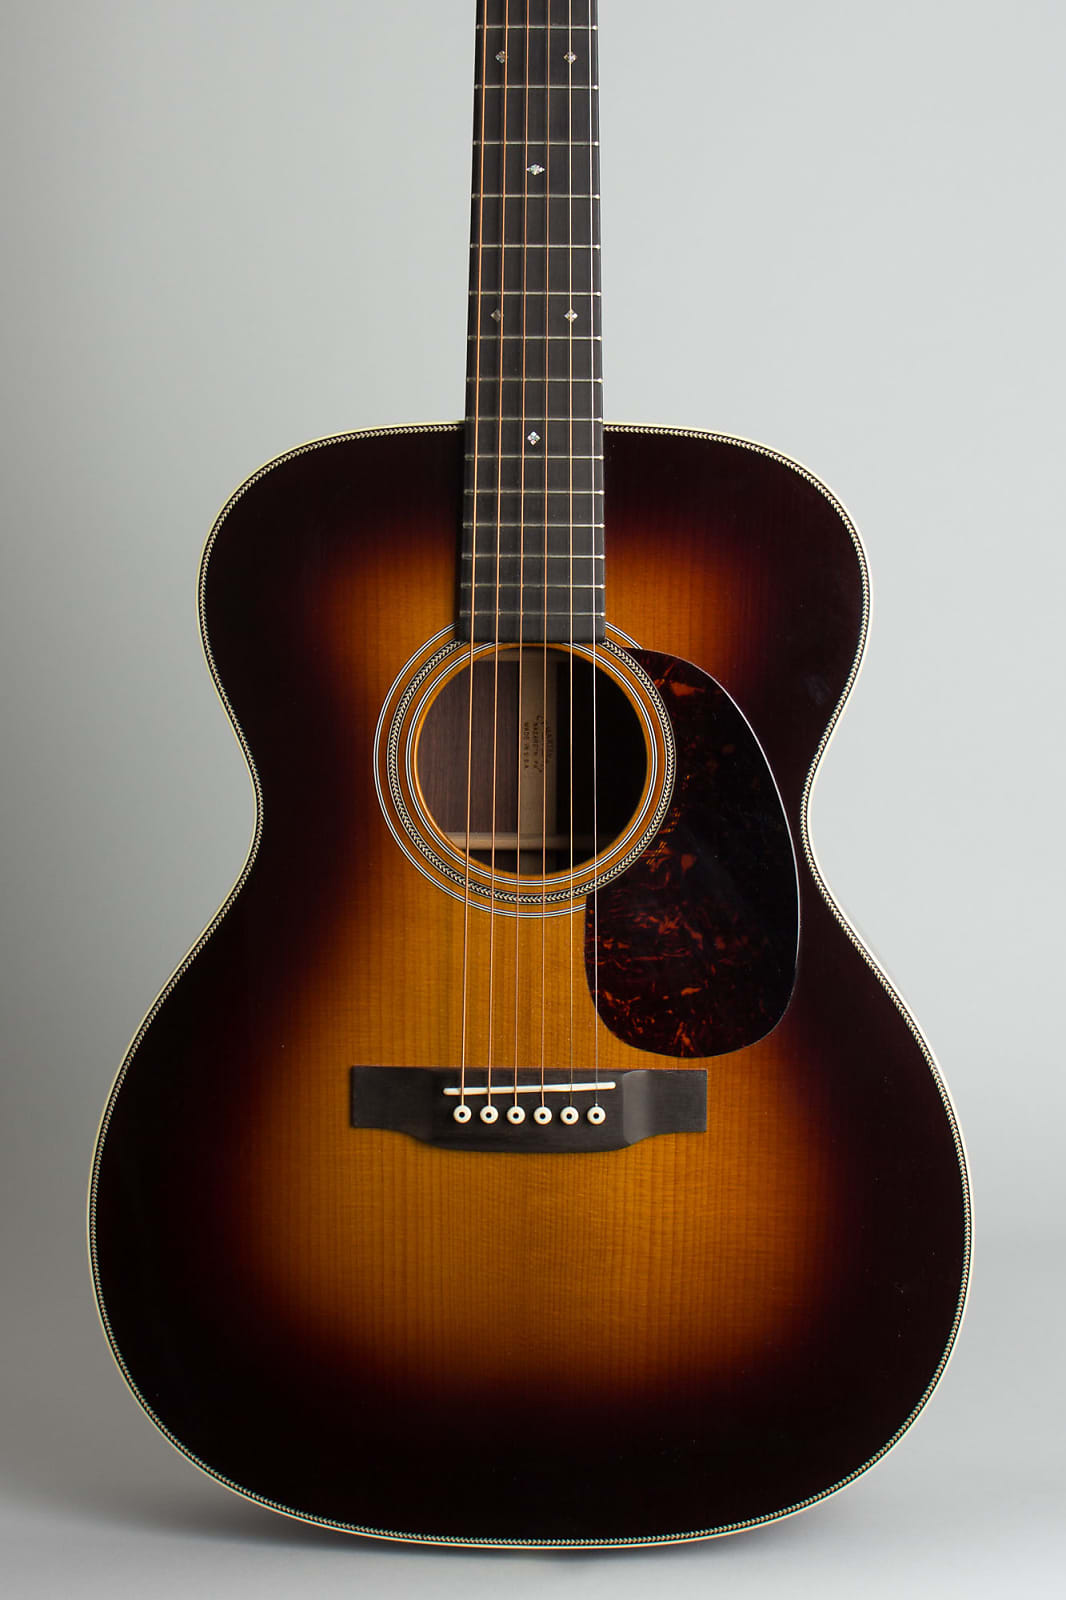 C. F. Martin  000-28 Custom Shop Flat Top Acoustic Guitar (2014), ser. #1844219, original black hard shell case.